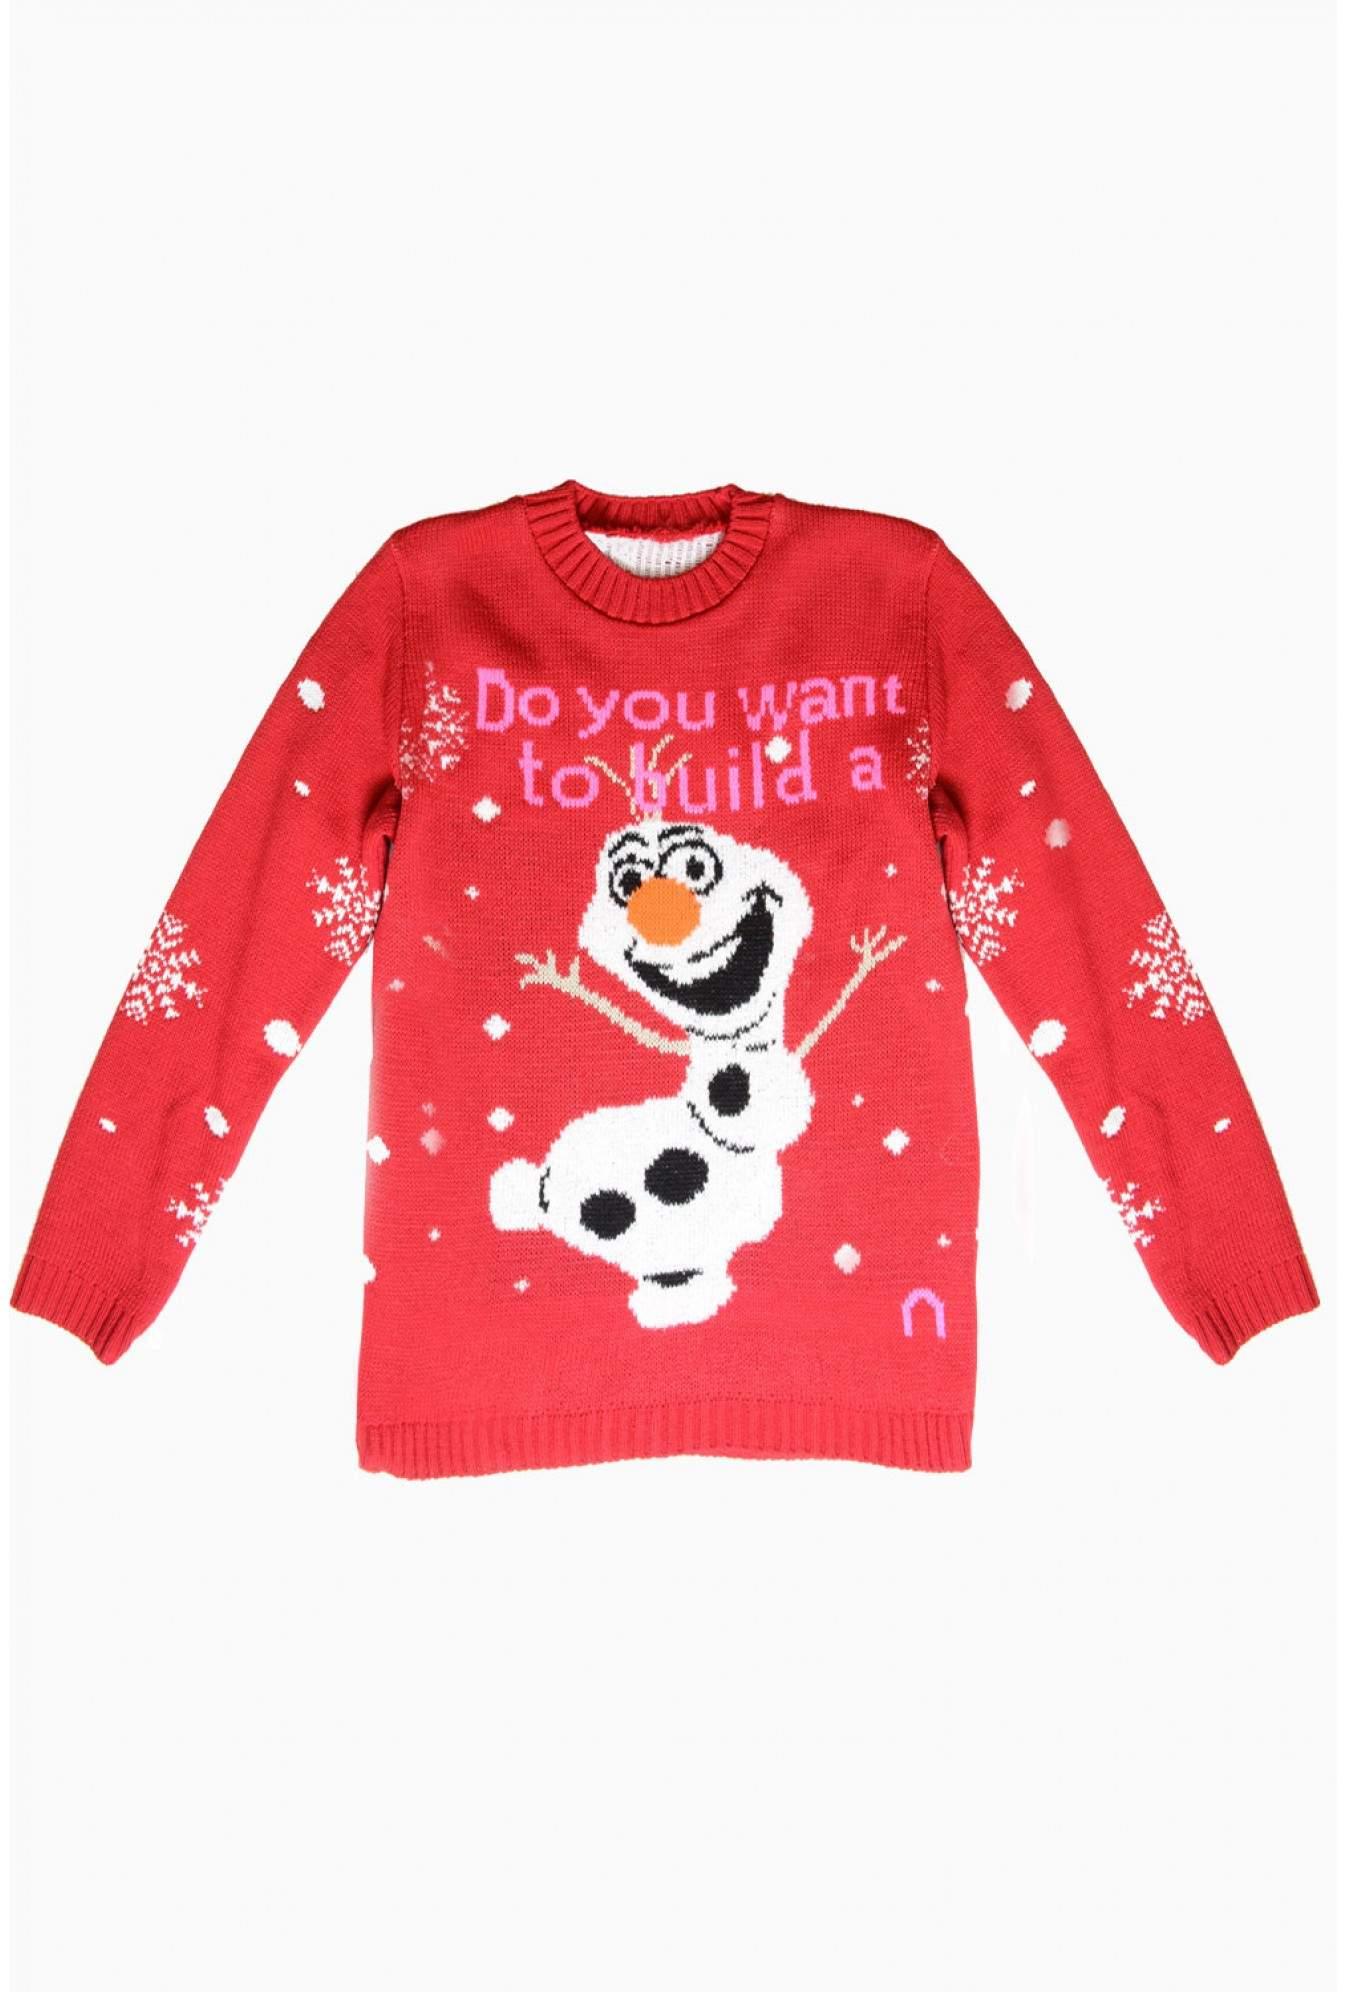 USCO Olaf Kids Christmas Jumper in Red | iCLOTHING